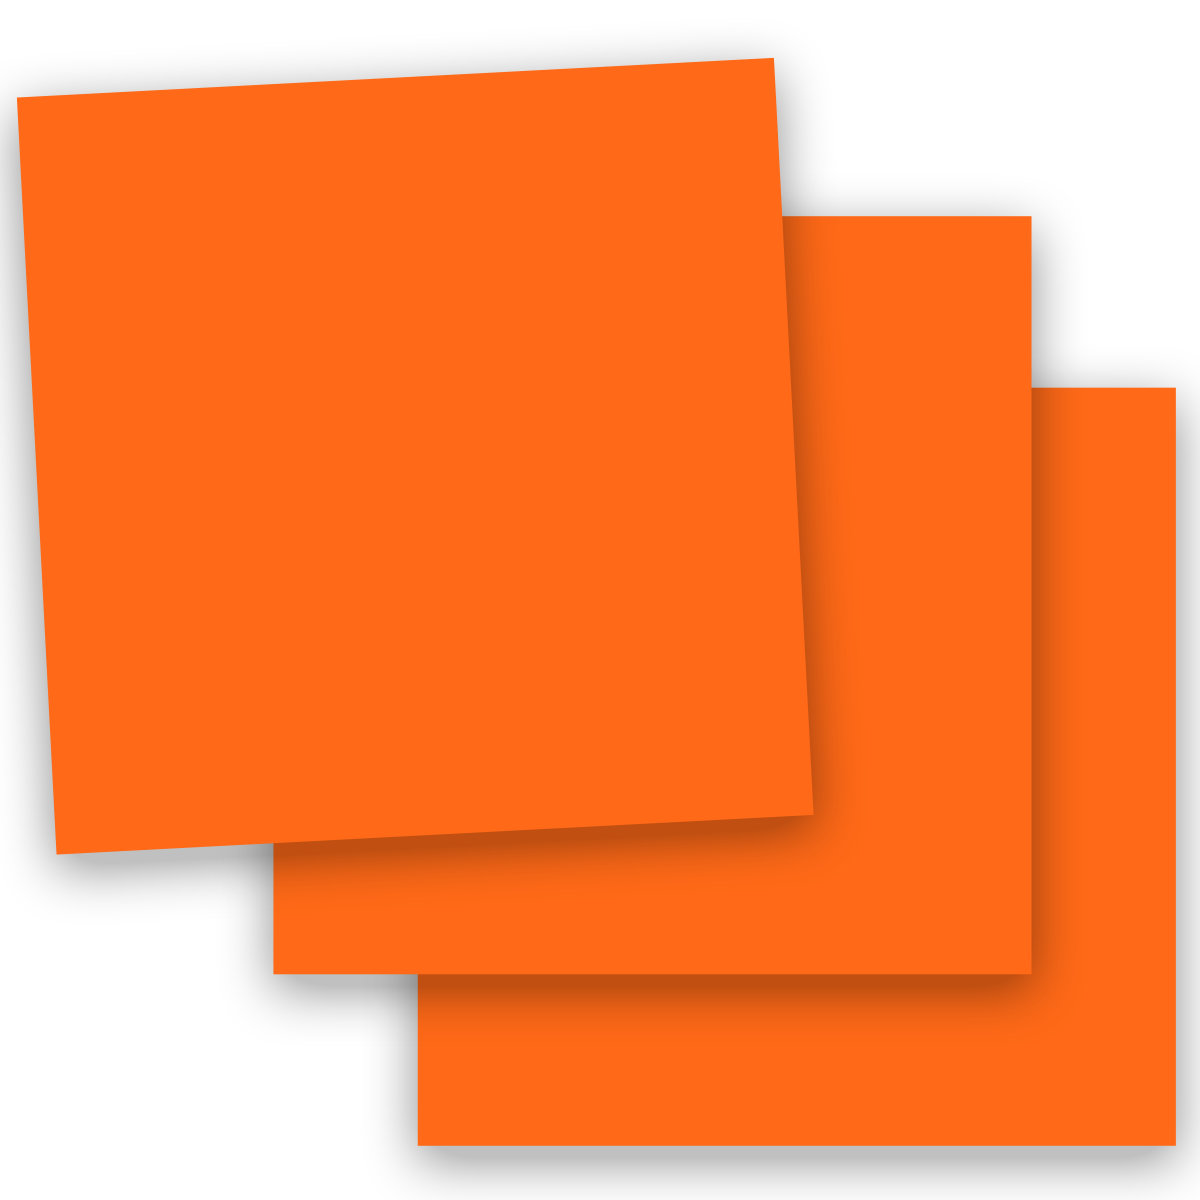 skin smooth orange 12x12 square paper 100c cardstock